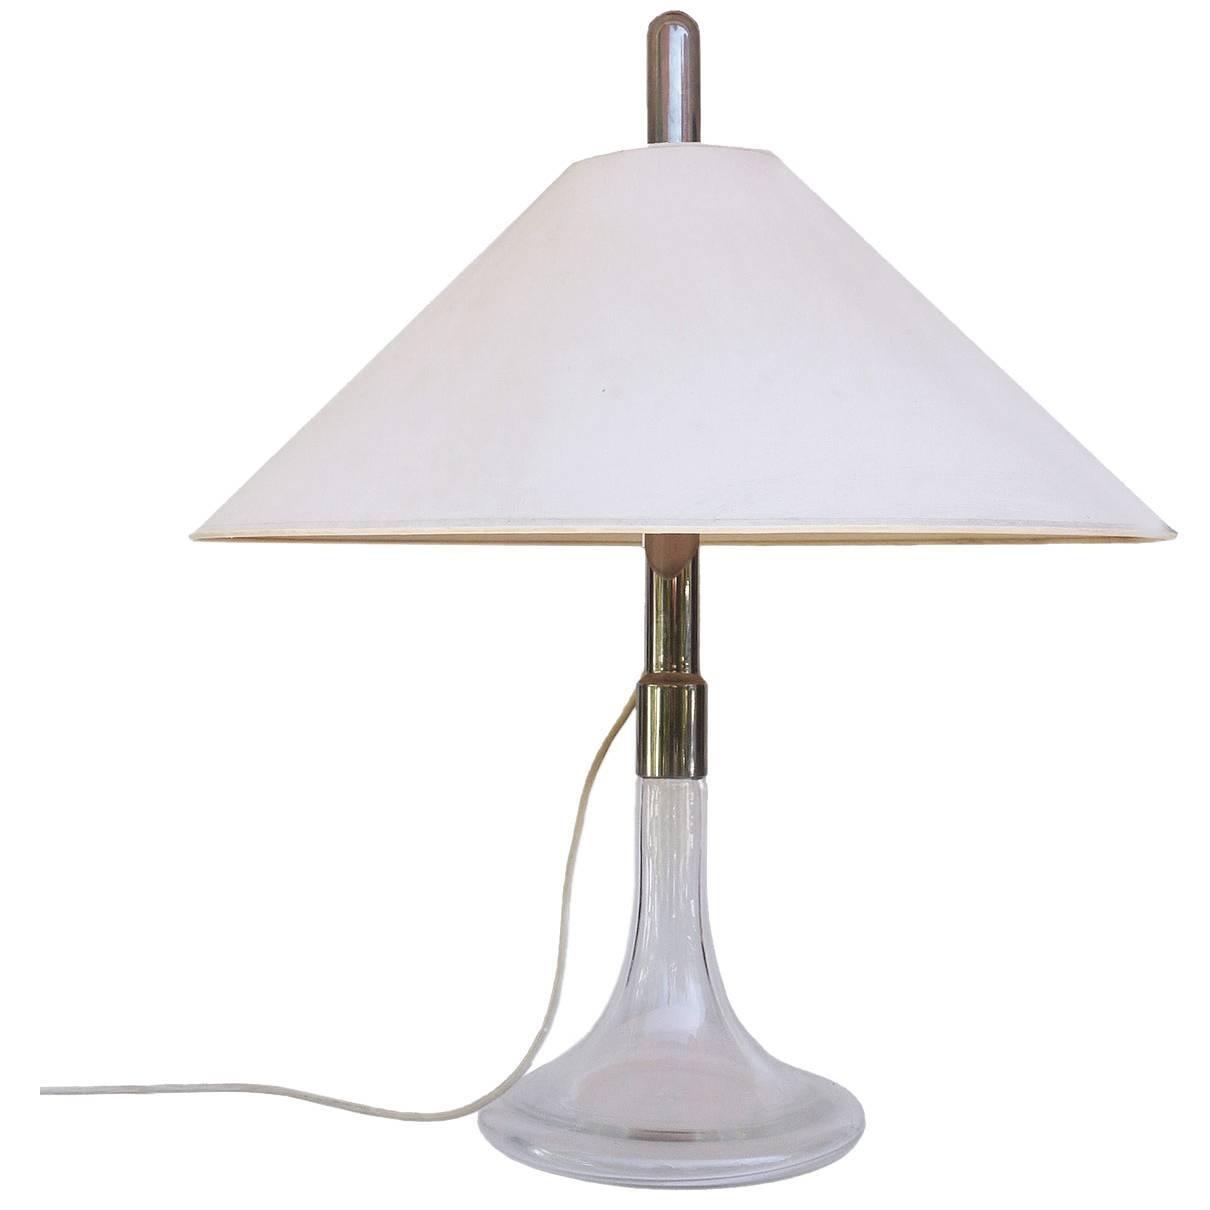 Ingo Maurer Table Lamp Glass & Chrome, Design M, Germany, 1960s